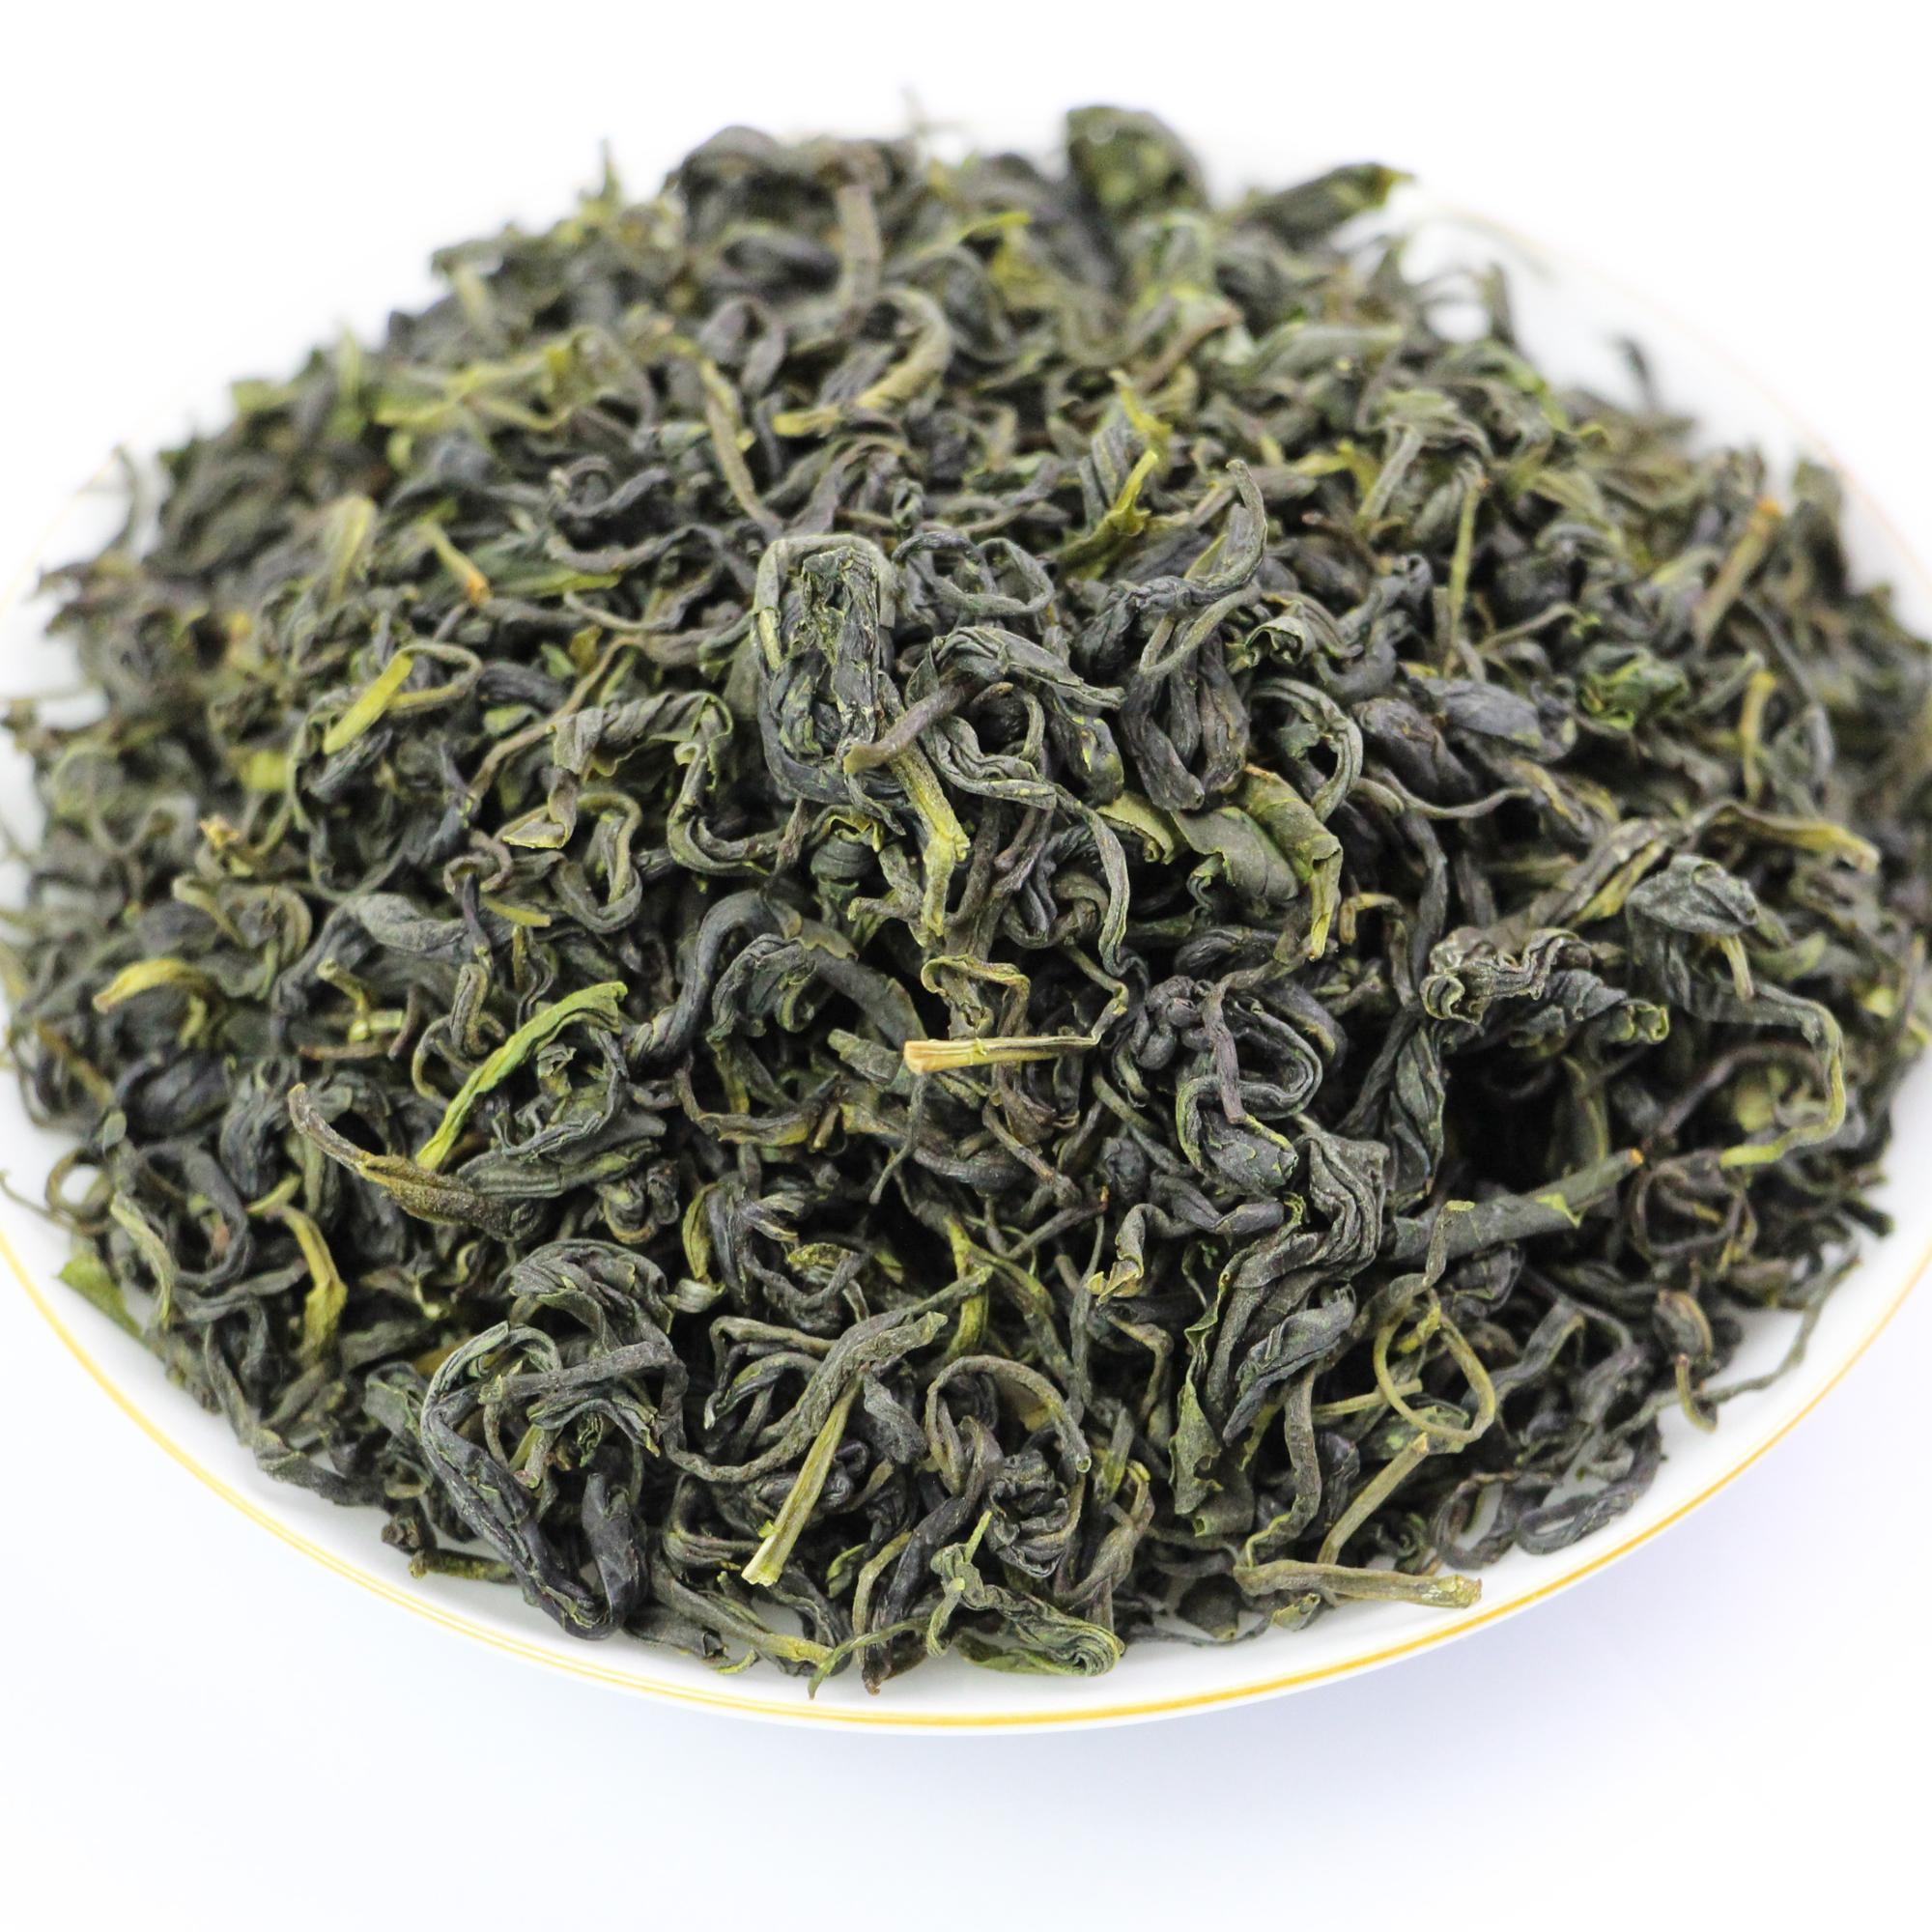 D-A maojian organic green tea price per kg green tea price per kg - 4uTea | 4uTea.com